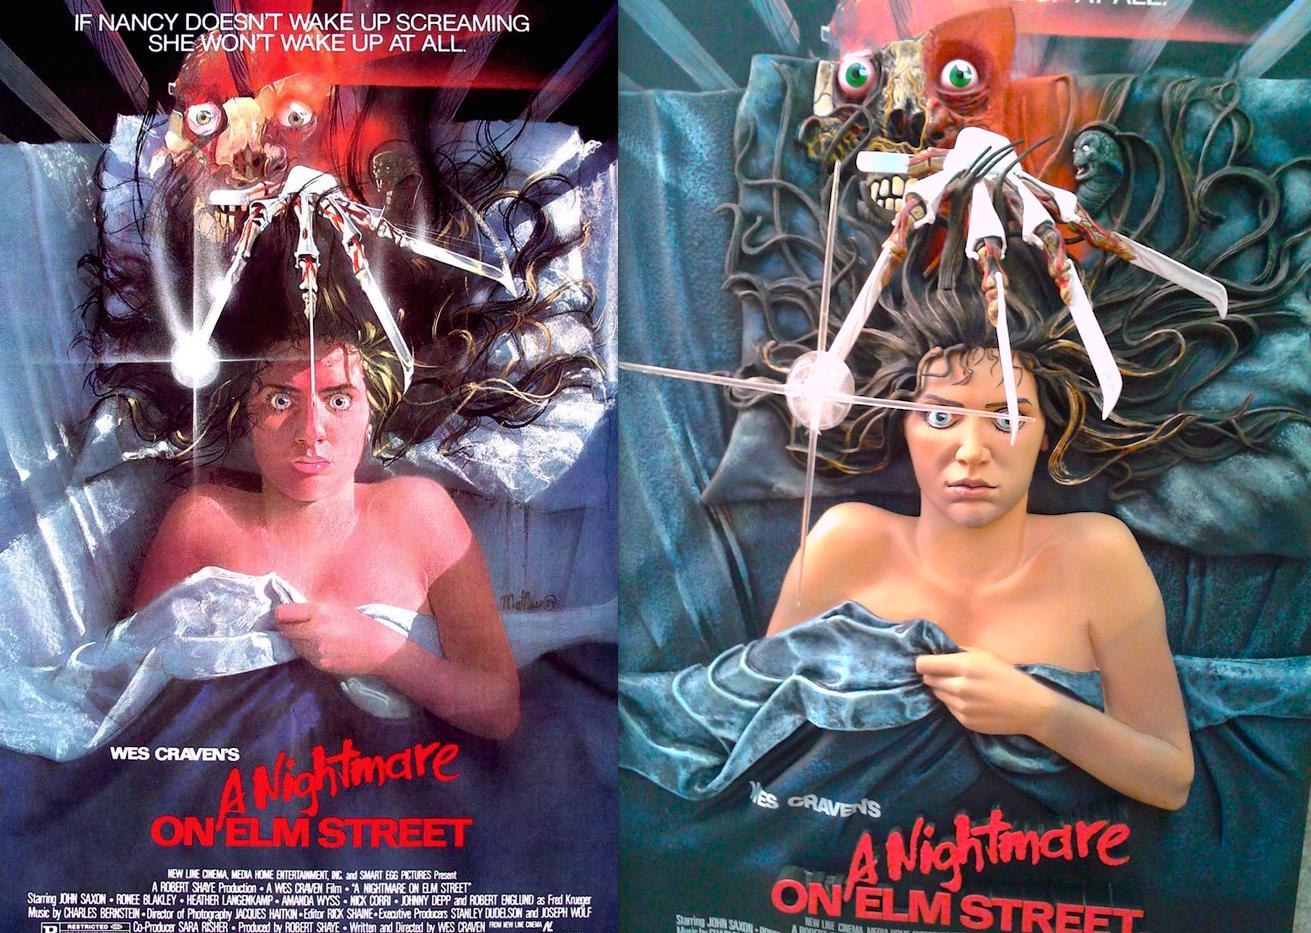 Nightmare on elm street 3 movie poster